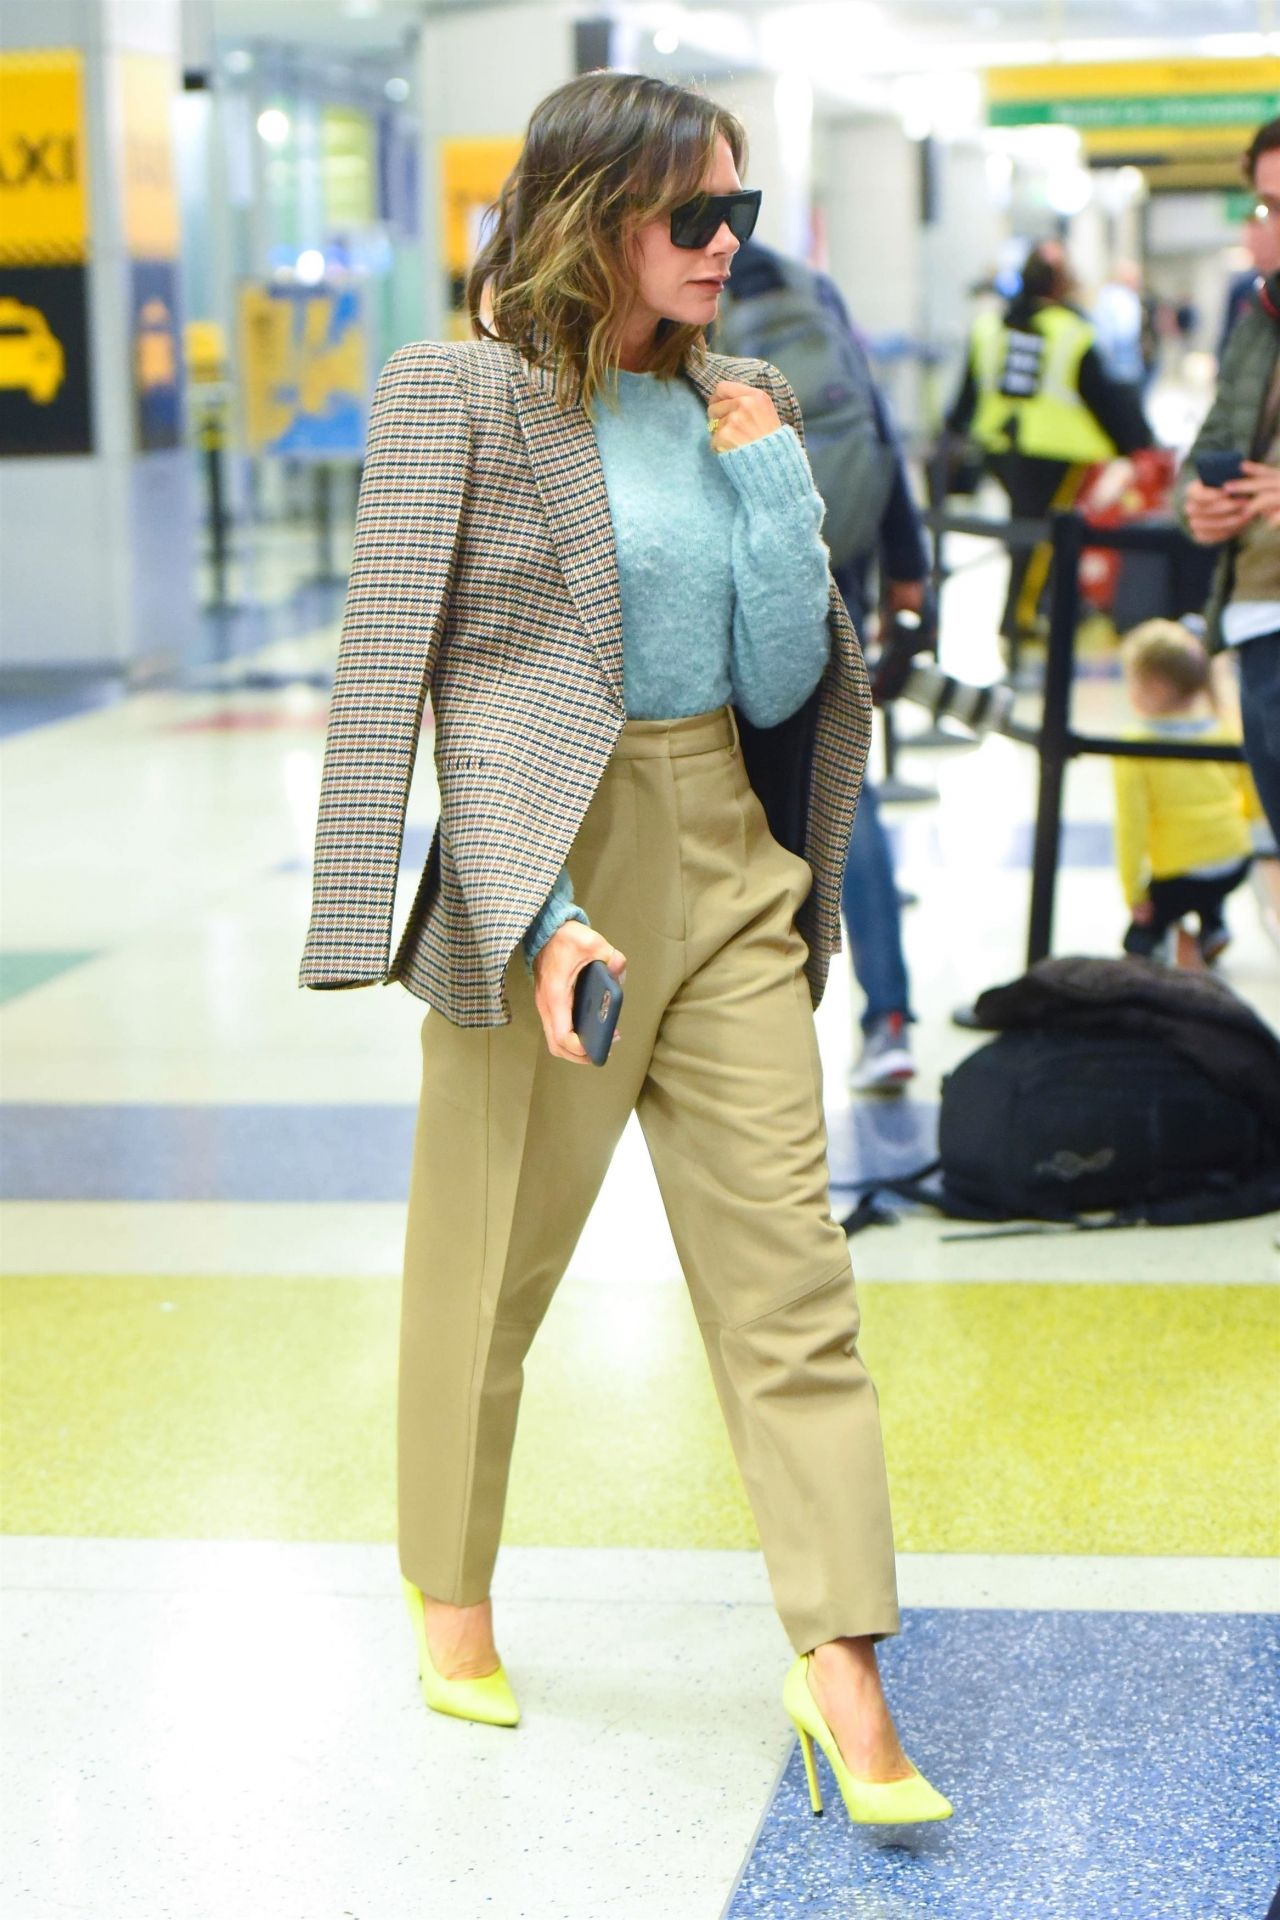 victoria-beckham-style-jfk-airport-in-new-york-10-14-2019-6